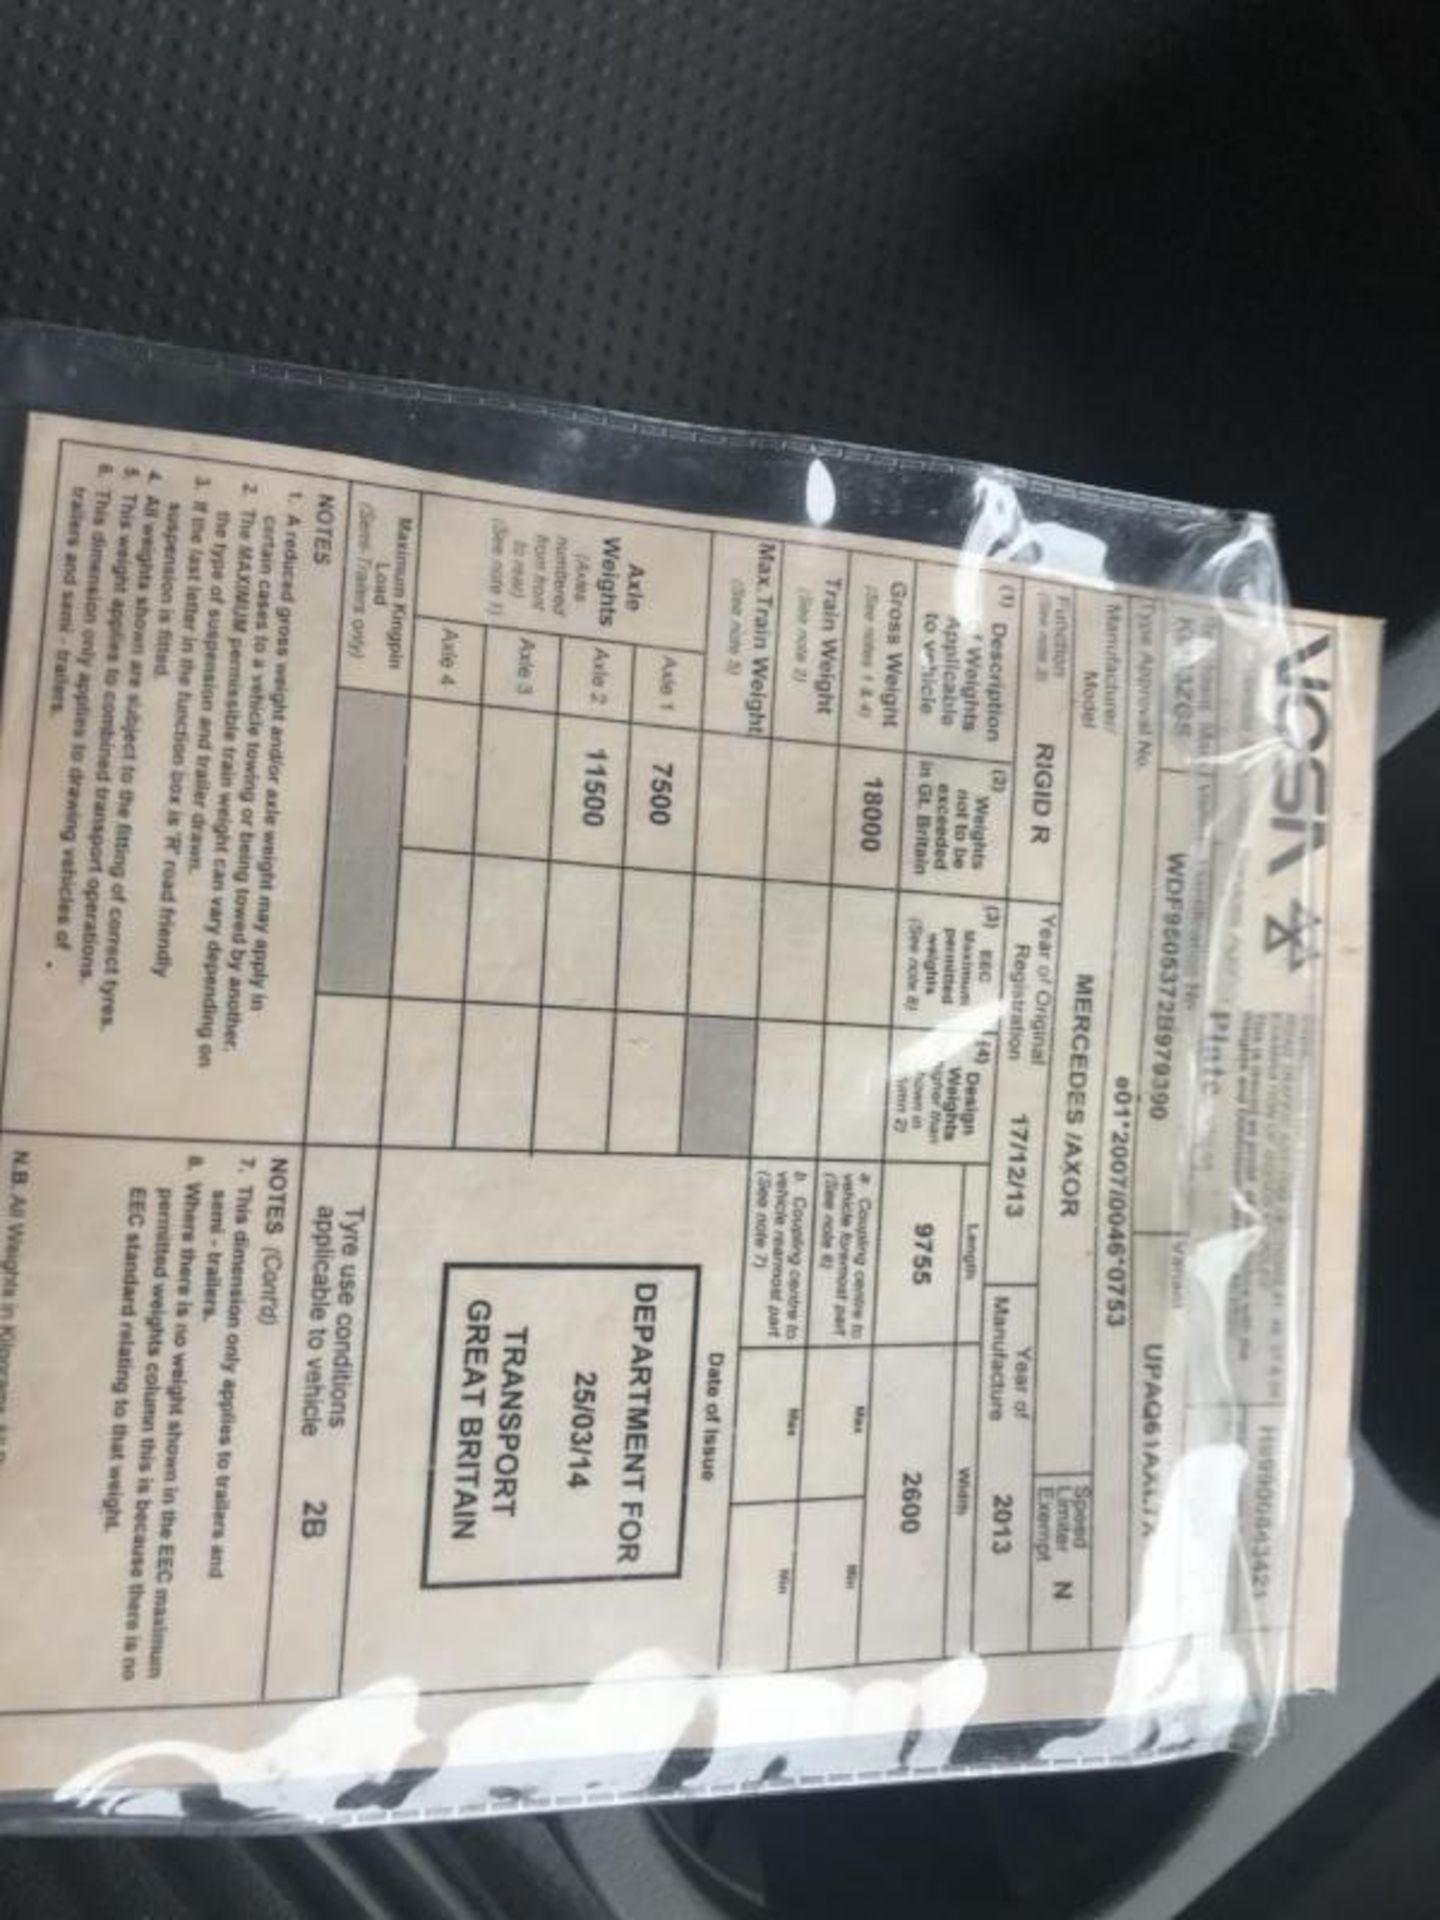 2013/63 REG MERCEDES-BENZ AXOR ATEGO 1824L DAY WHITE FRIDGE BOX TAIL LIFT AIR SUSPENSION *PLUS VAT* - Image 7 of 21